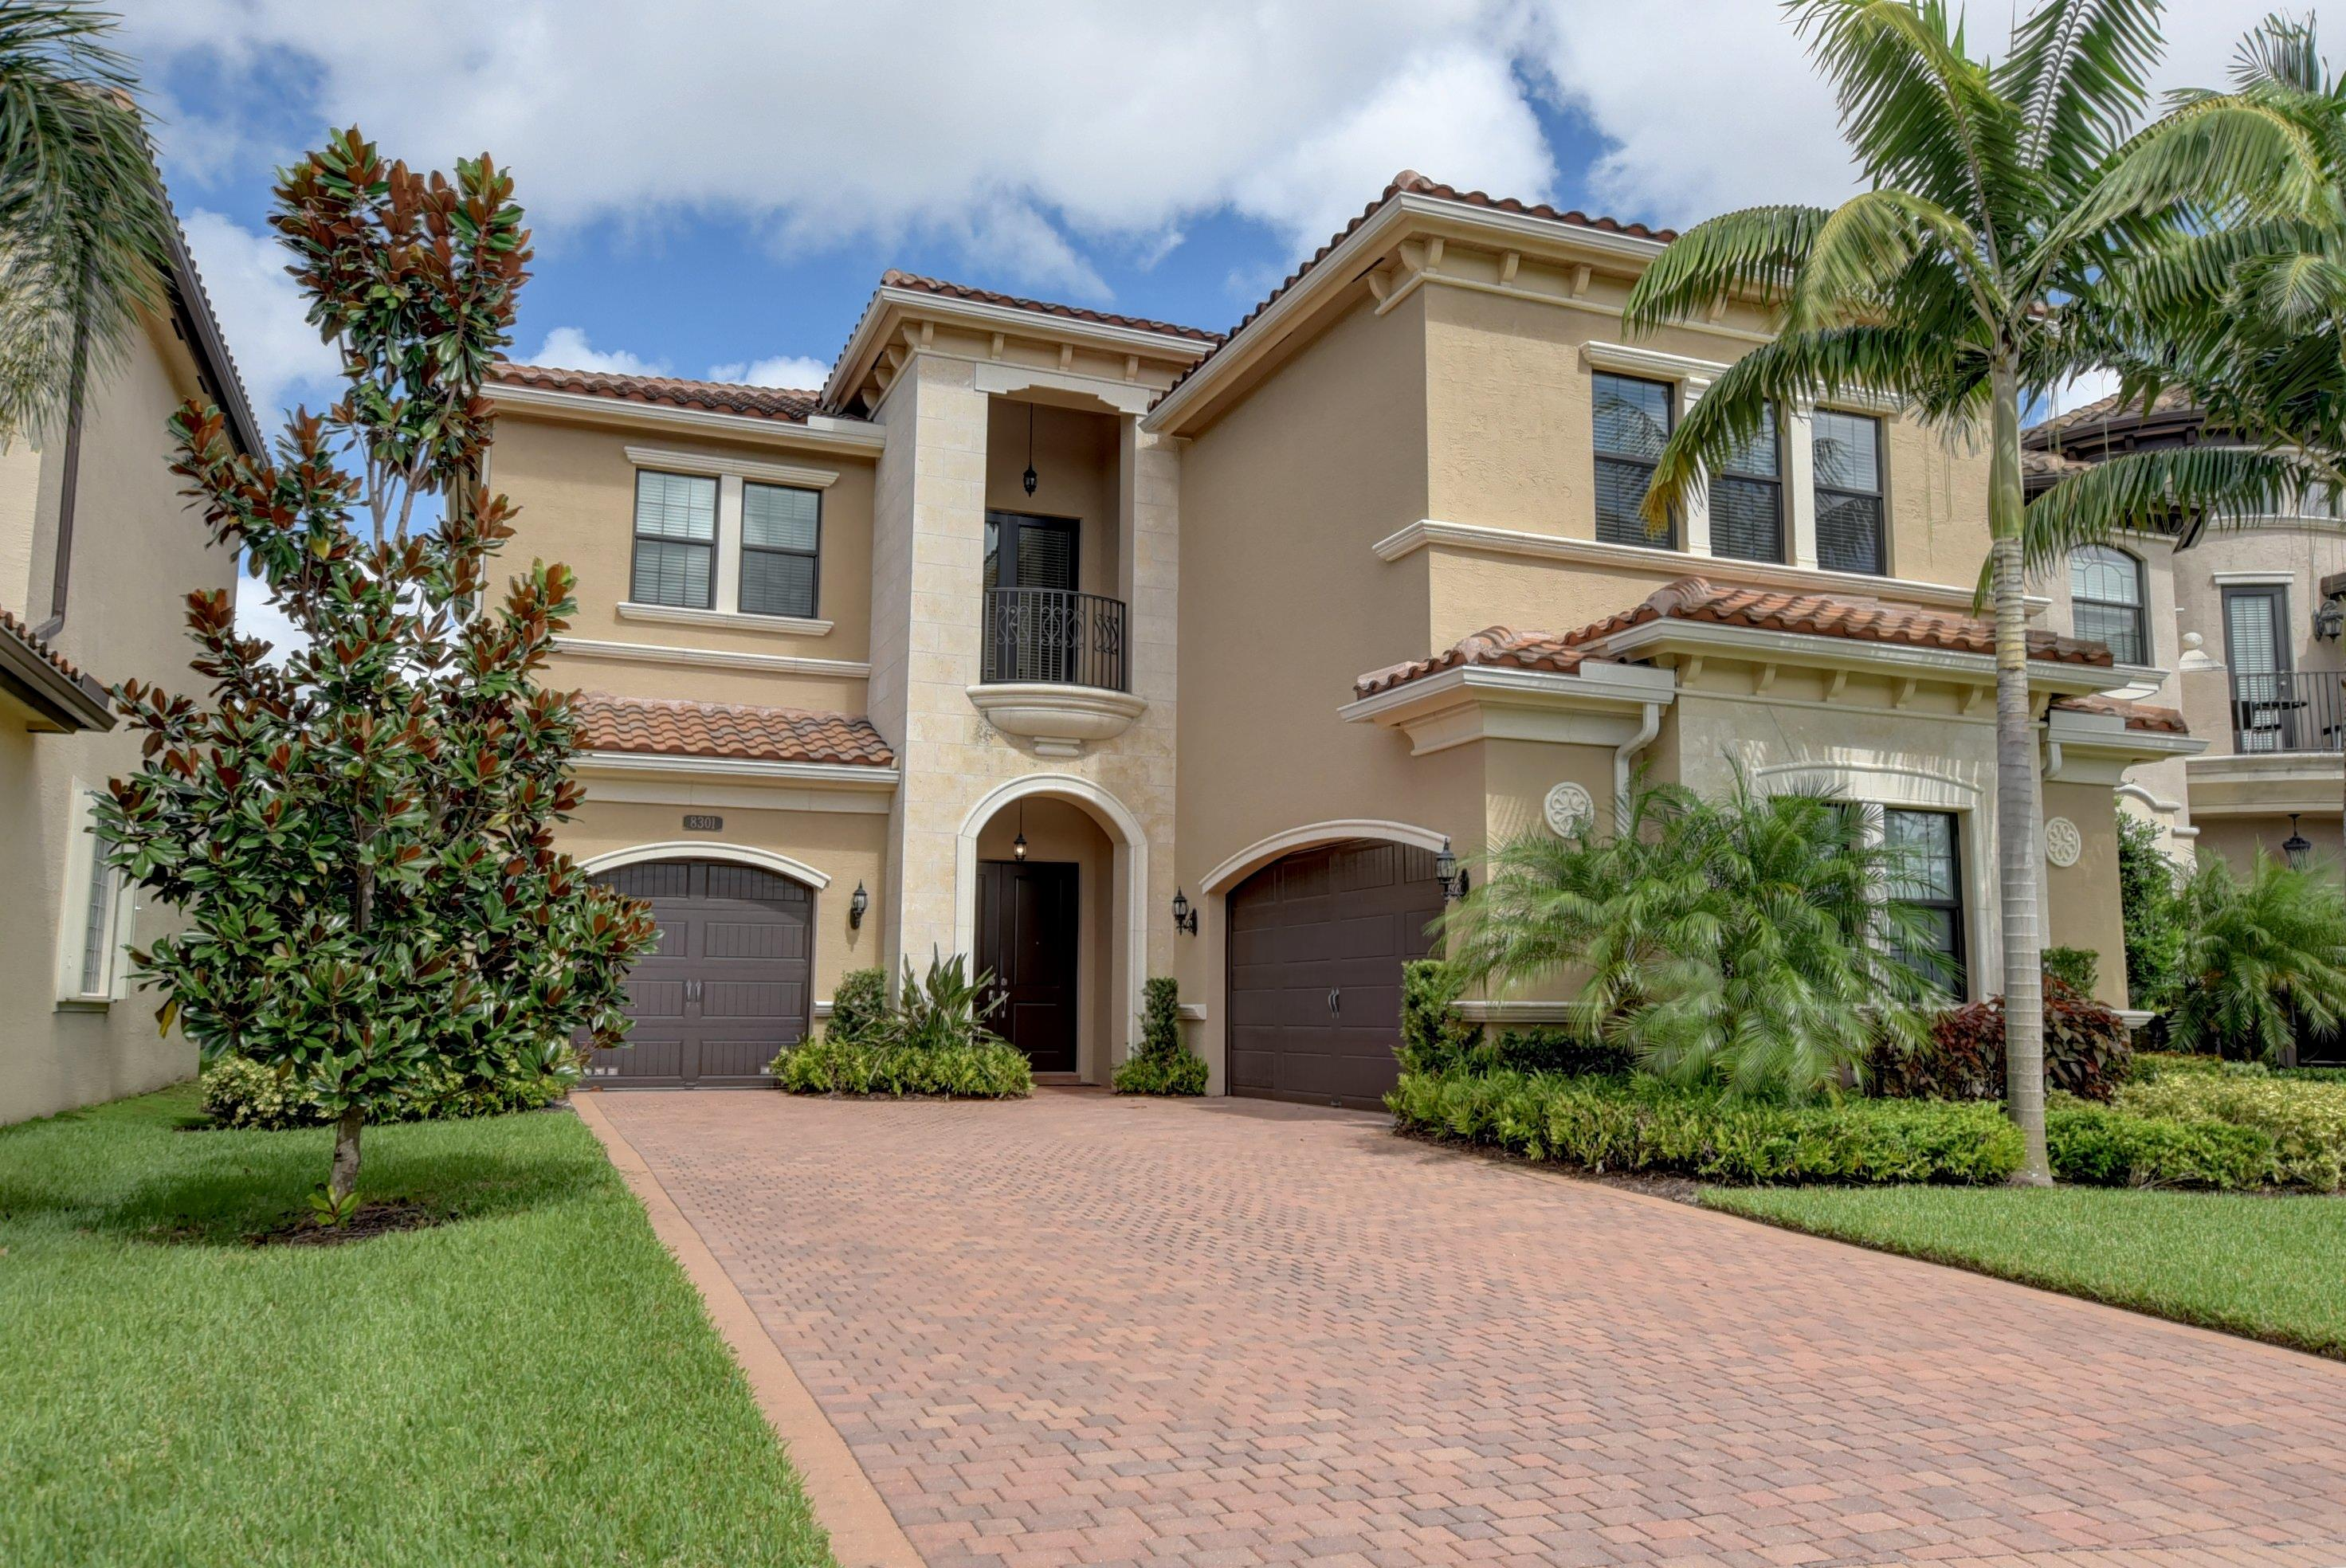 8301 Banpo Bridge Way, Delray Beach, Florida 33446, 5 Bedrooms Bedrooms, ,4.1 BathroomsBathrooms,Single Family,For Sale,THE BRIDGES,Banpo Bridge,RX-10435999